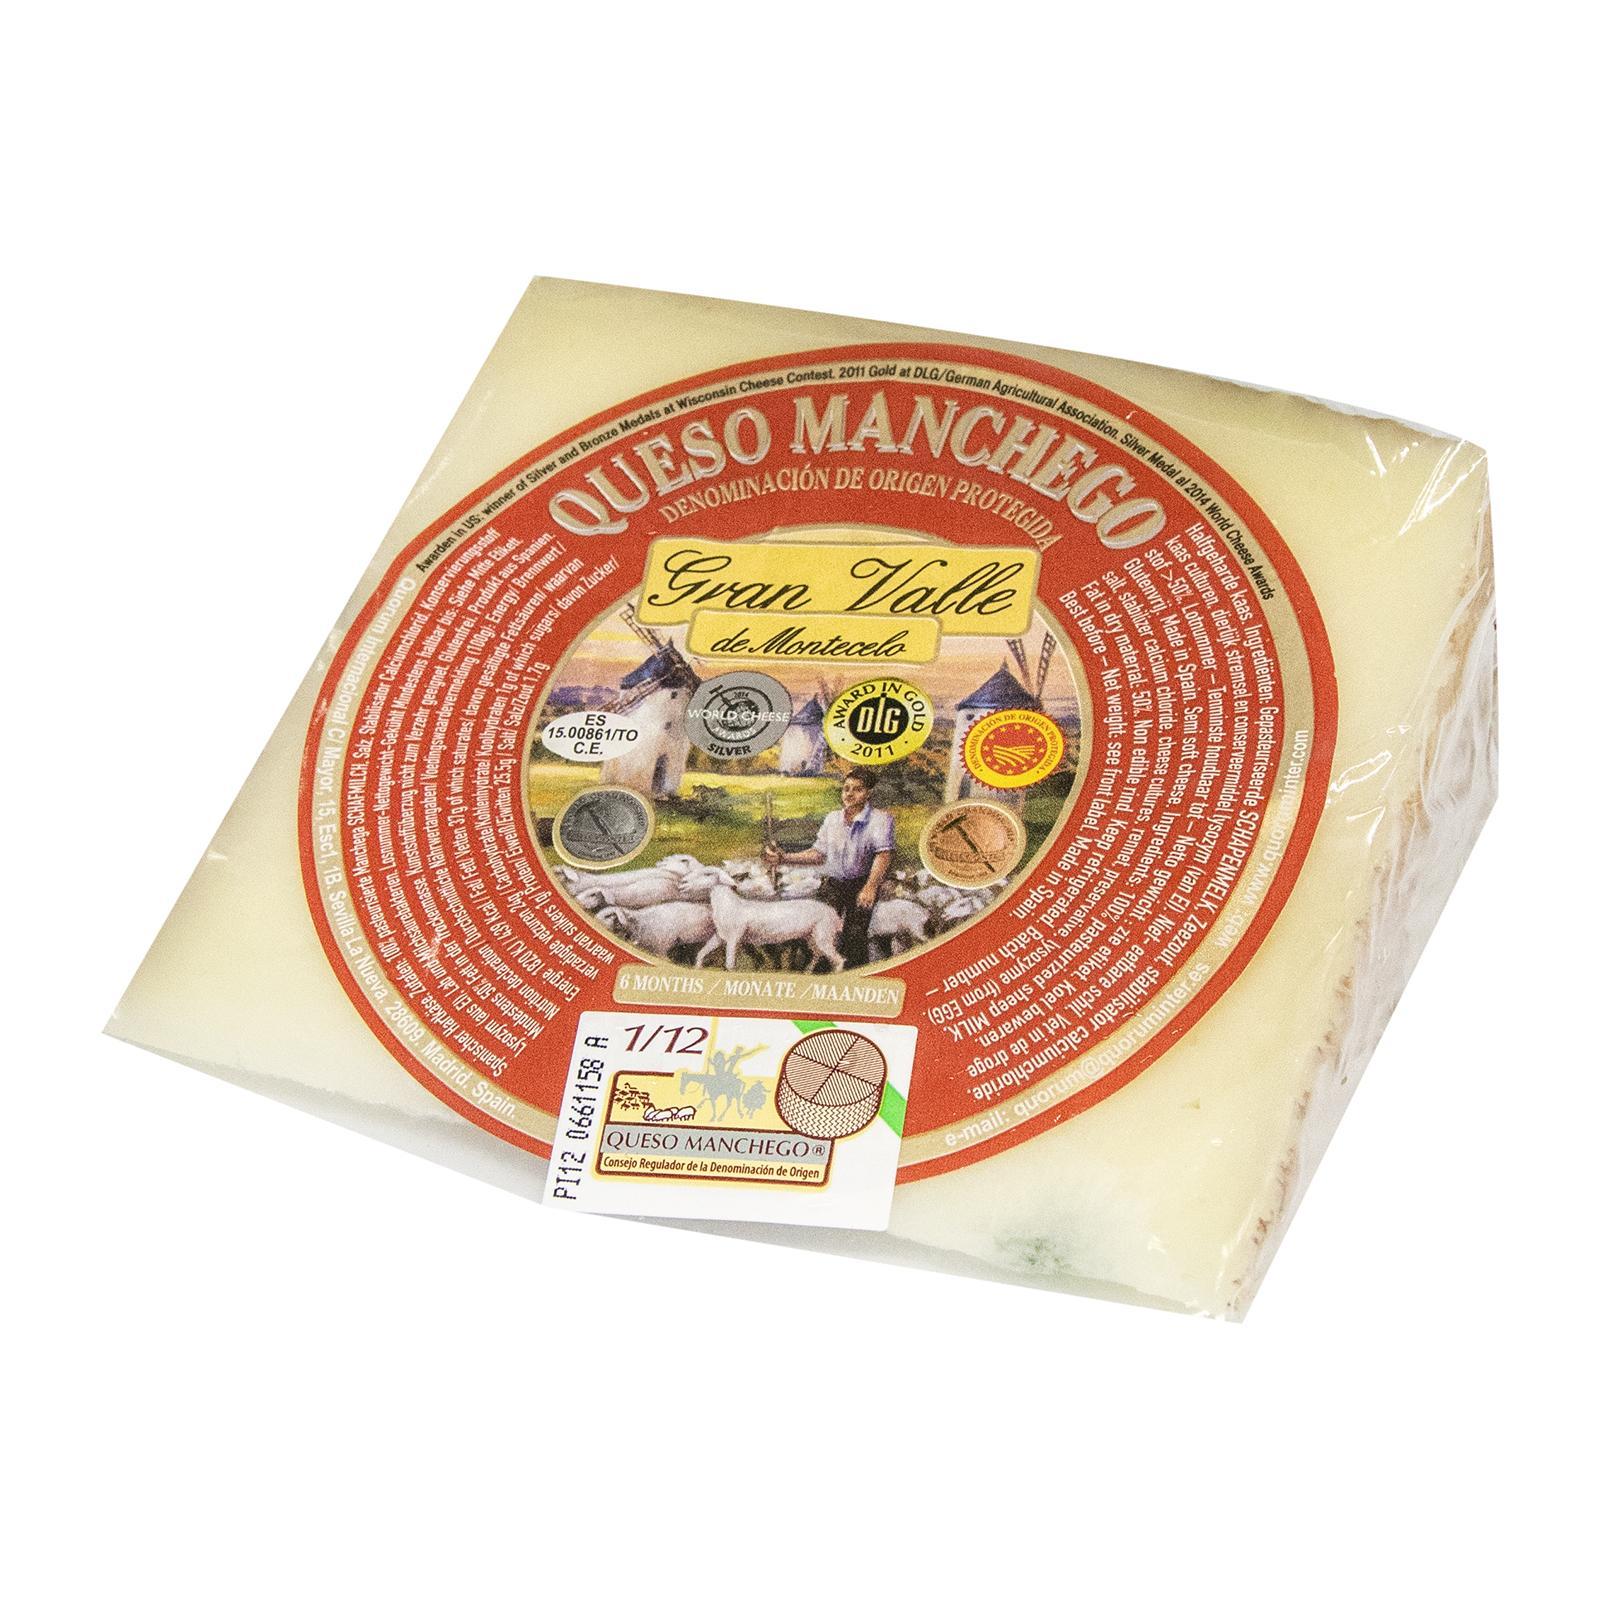 Bonvallis Spanish Cheese Queso Manchego DOP - Gran Valle Montecelo